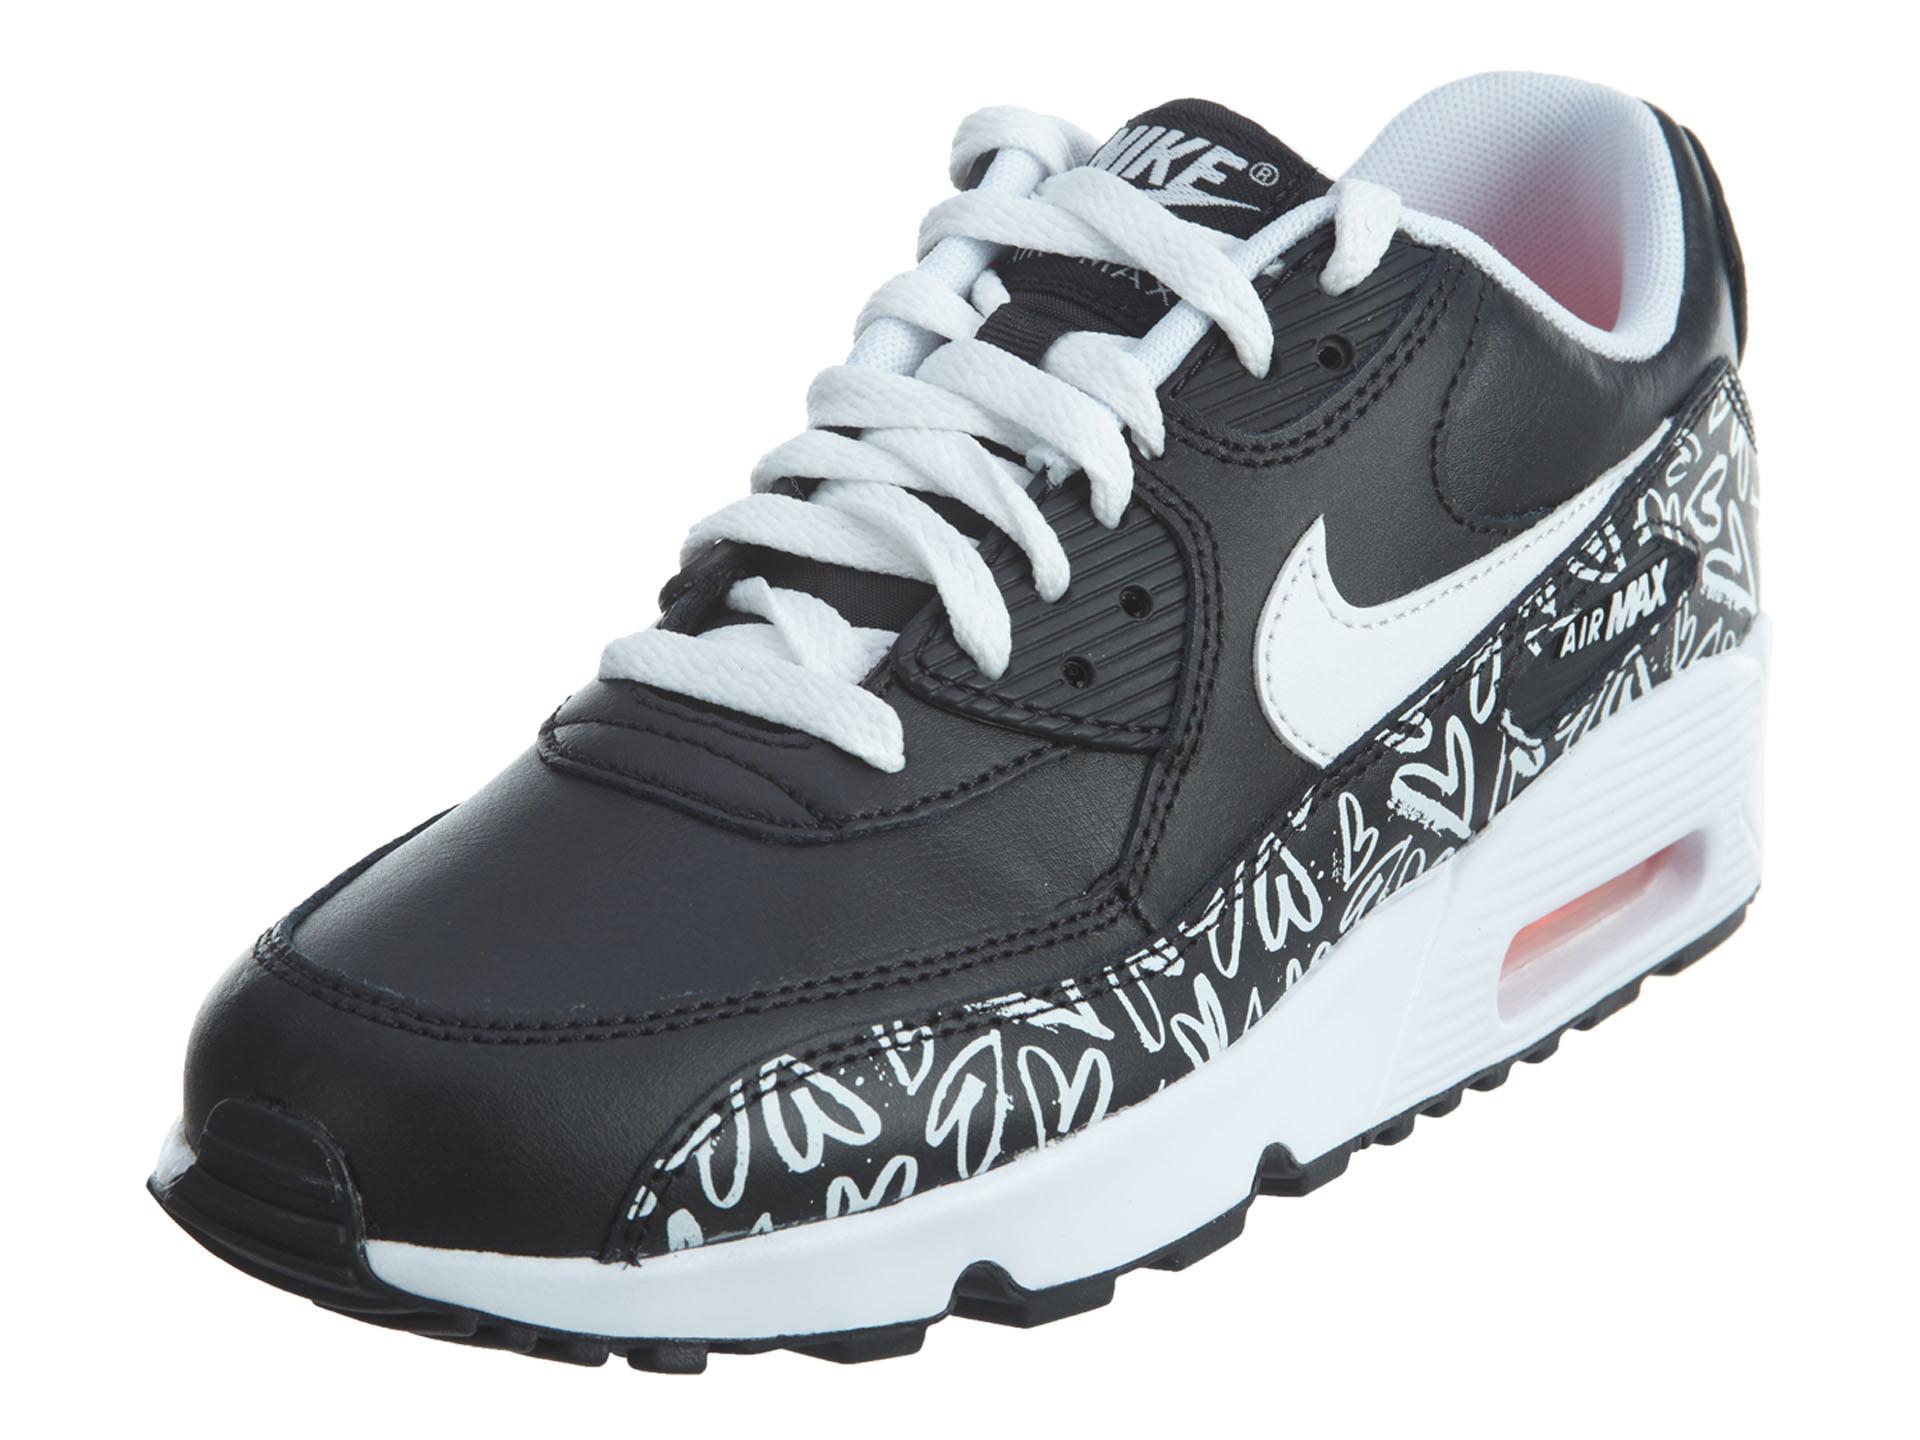 Nike - nike air max 90 - girls' grade